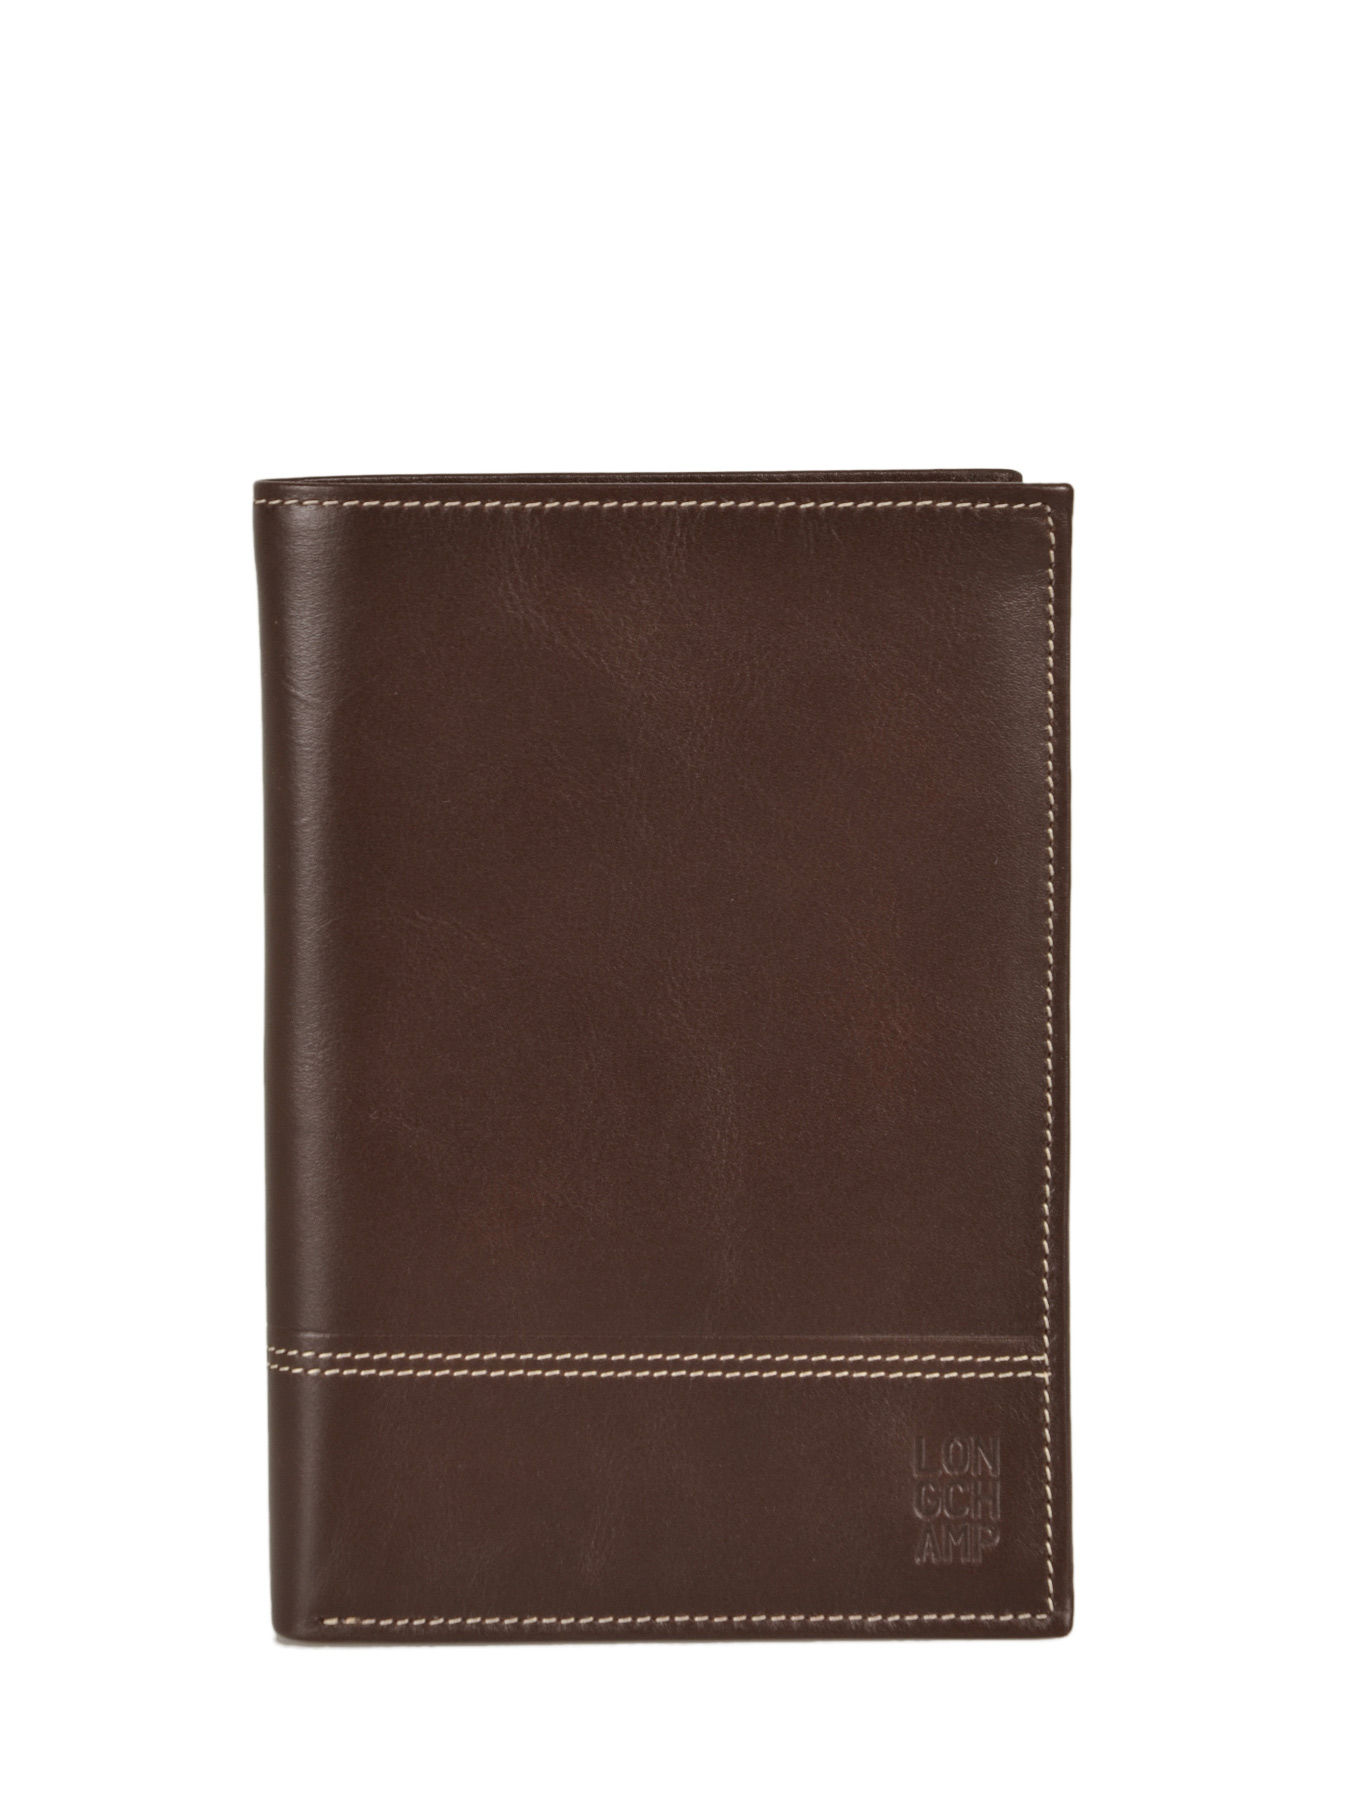 Portefeuilles homme Longchamp - Livraison offerte bfbeecbe249